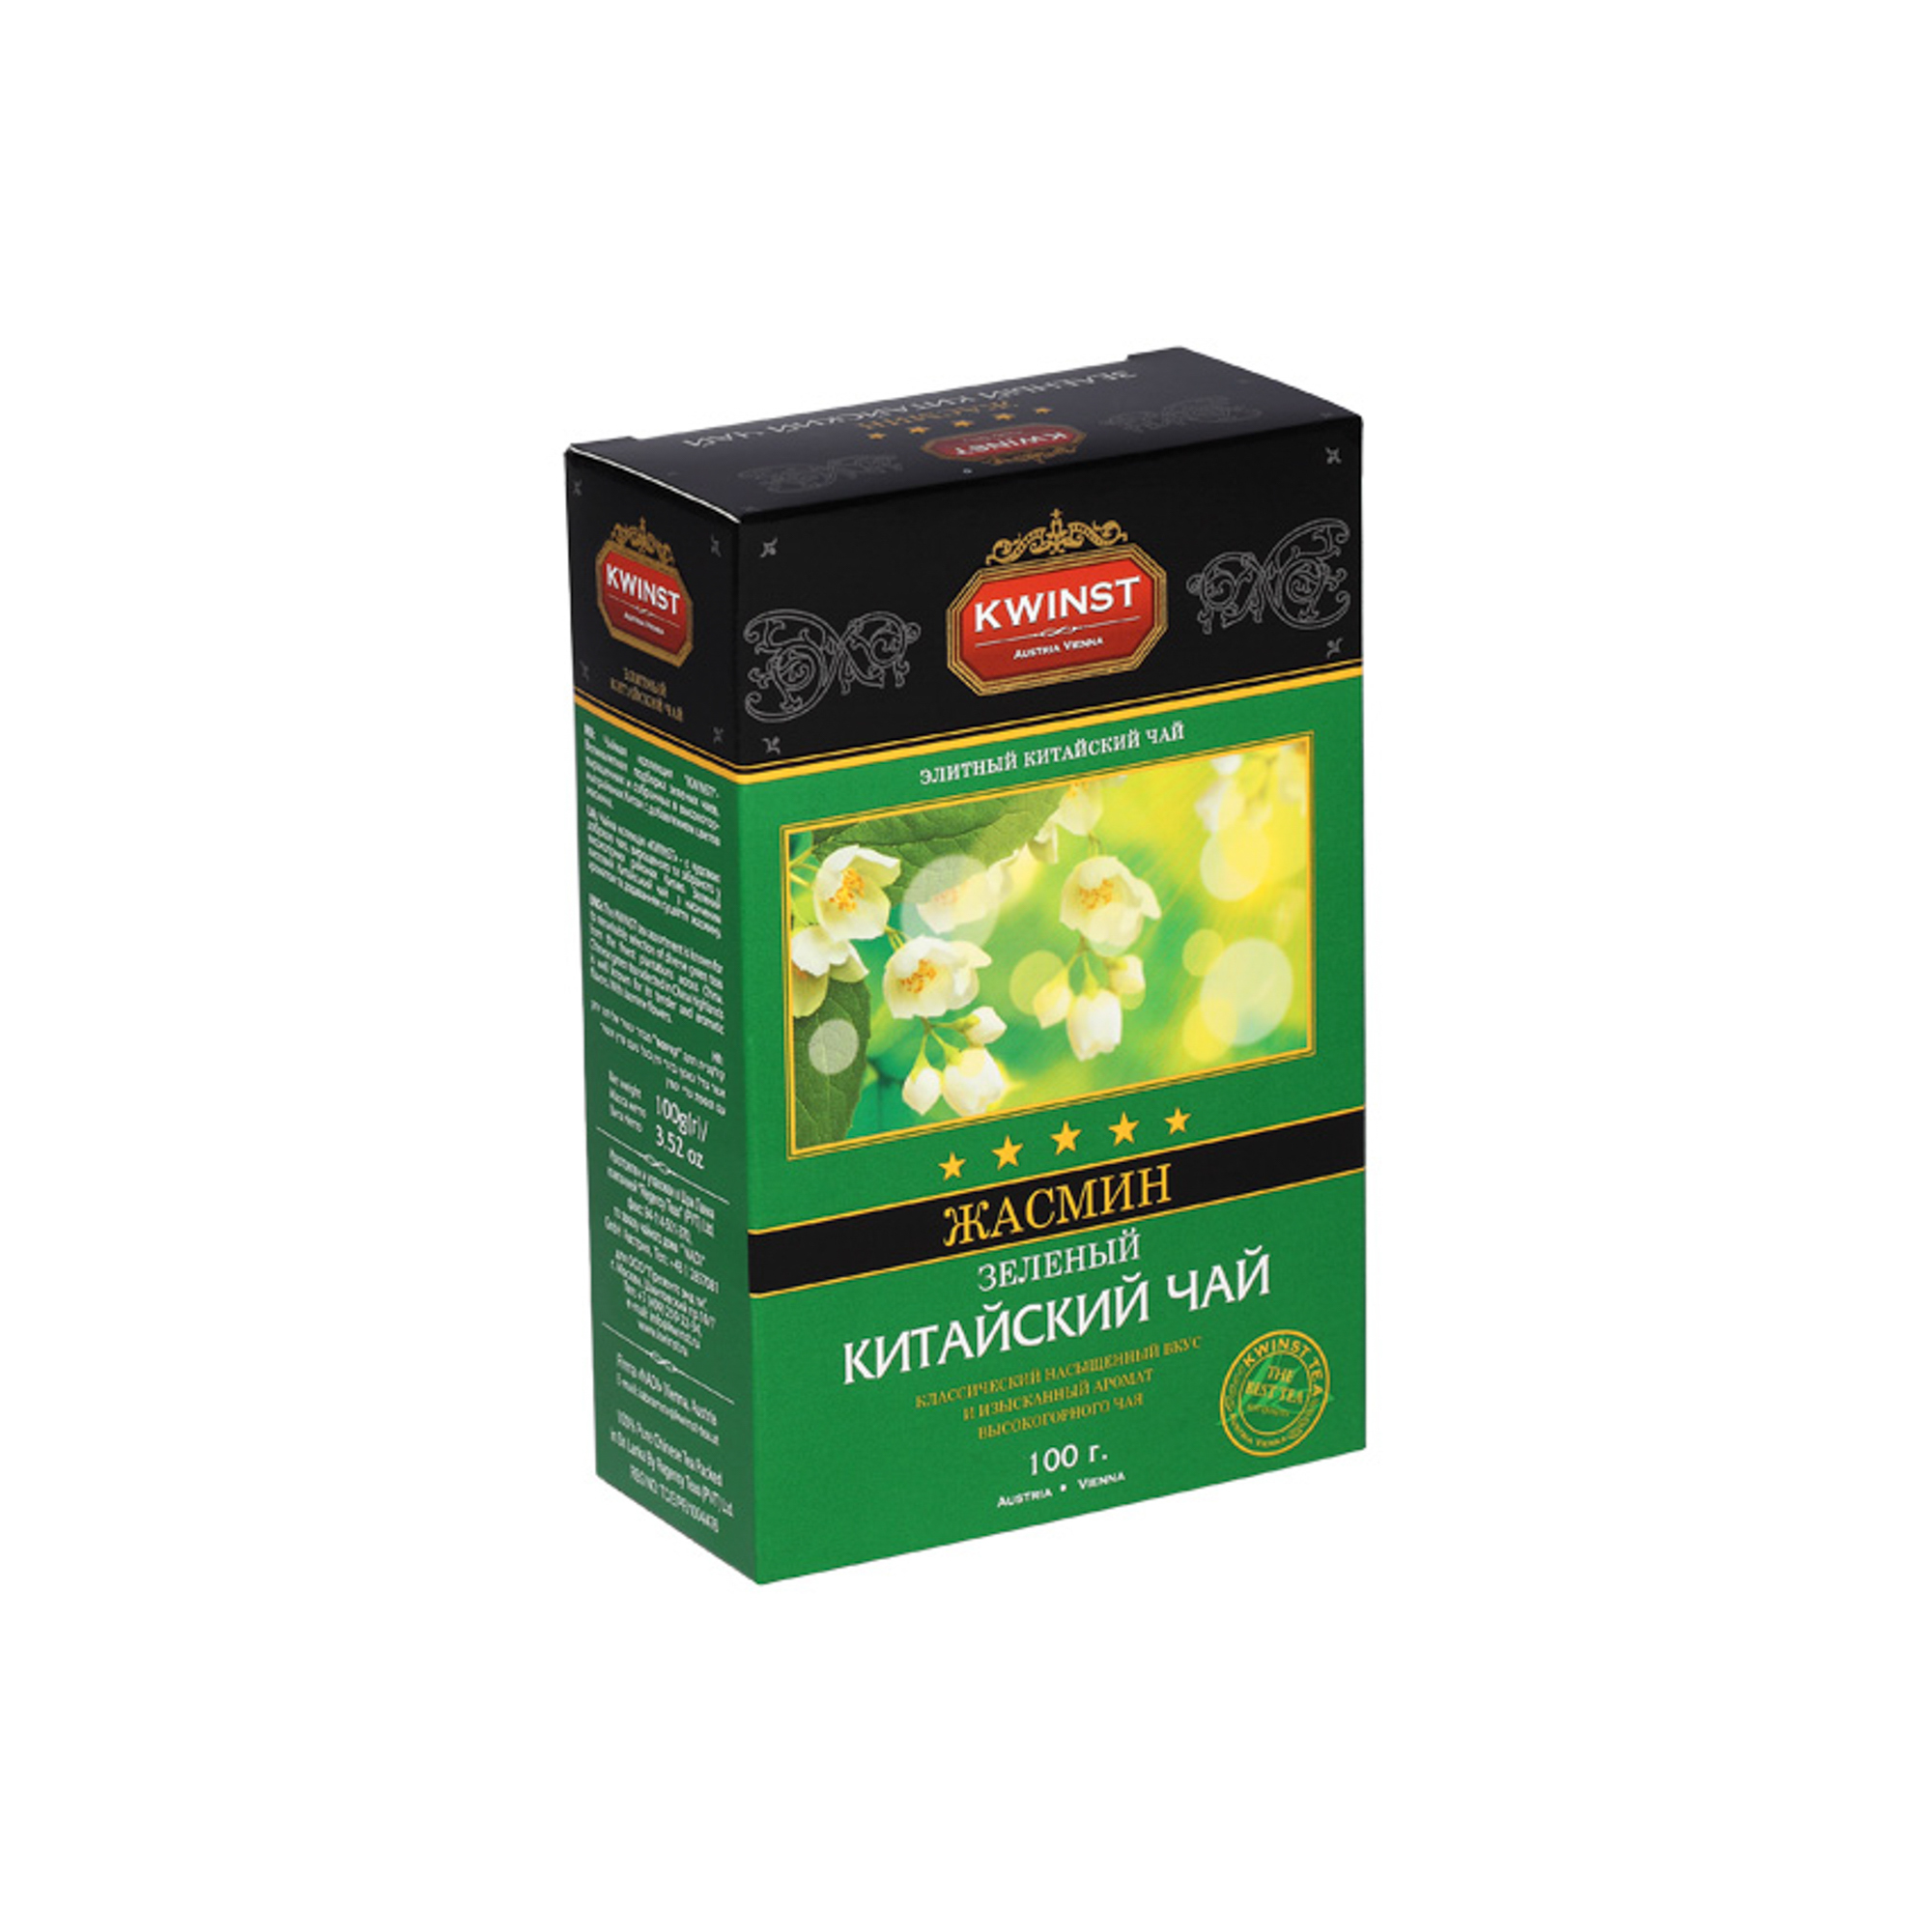 Чай зеленый Kwinst Жасмин листовой 100 г чай зеленый kwinst китайский 100 пакетиков